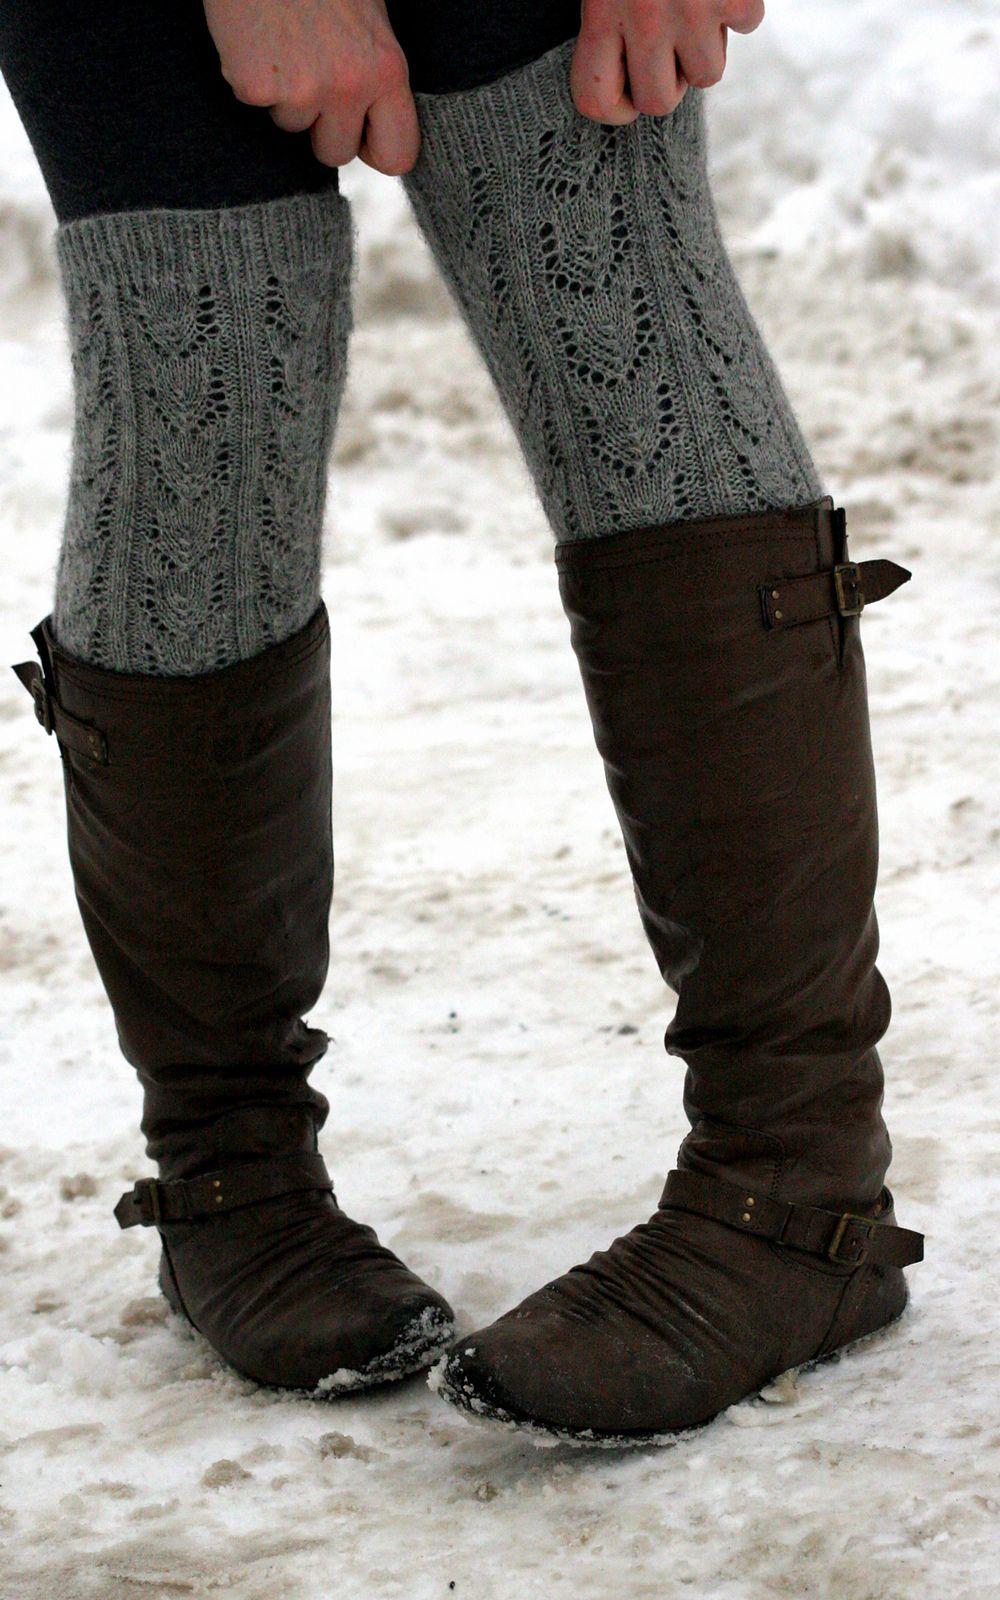 Legwarmers free pattern touch of grey pinterest free boot toppers legwarmers free pattern knitting bankloansurffo Gallery